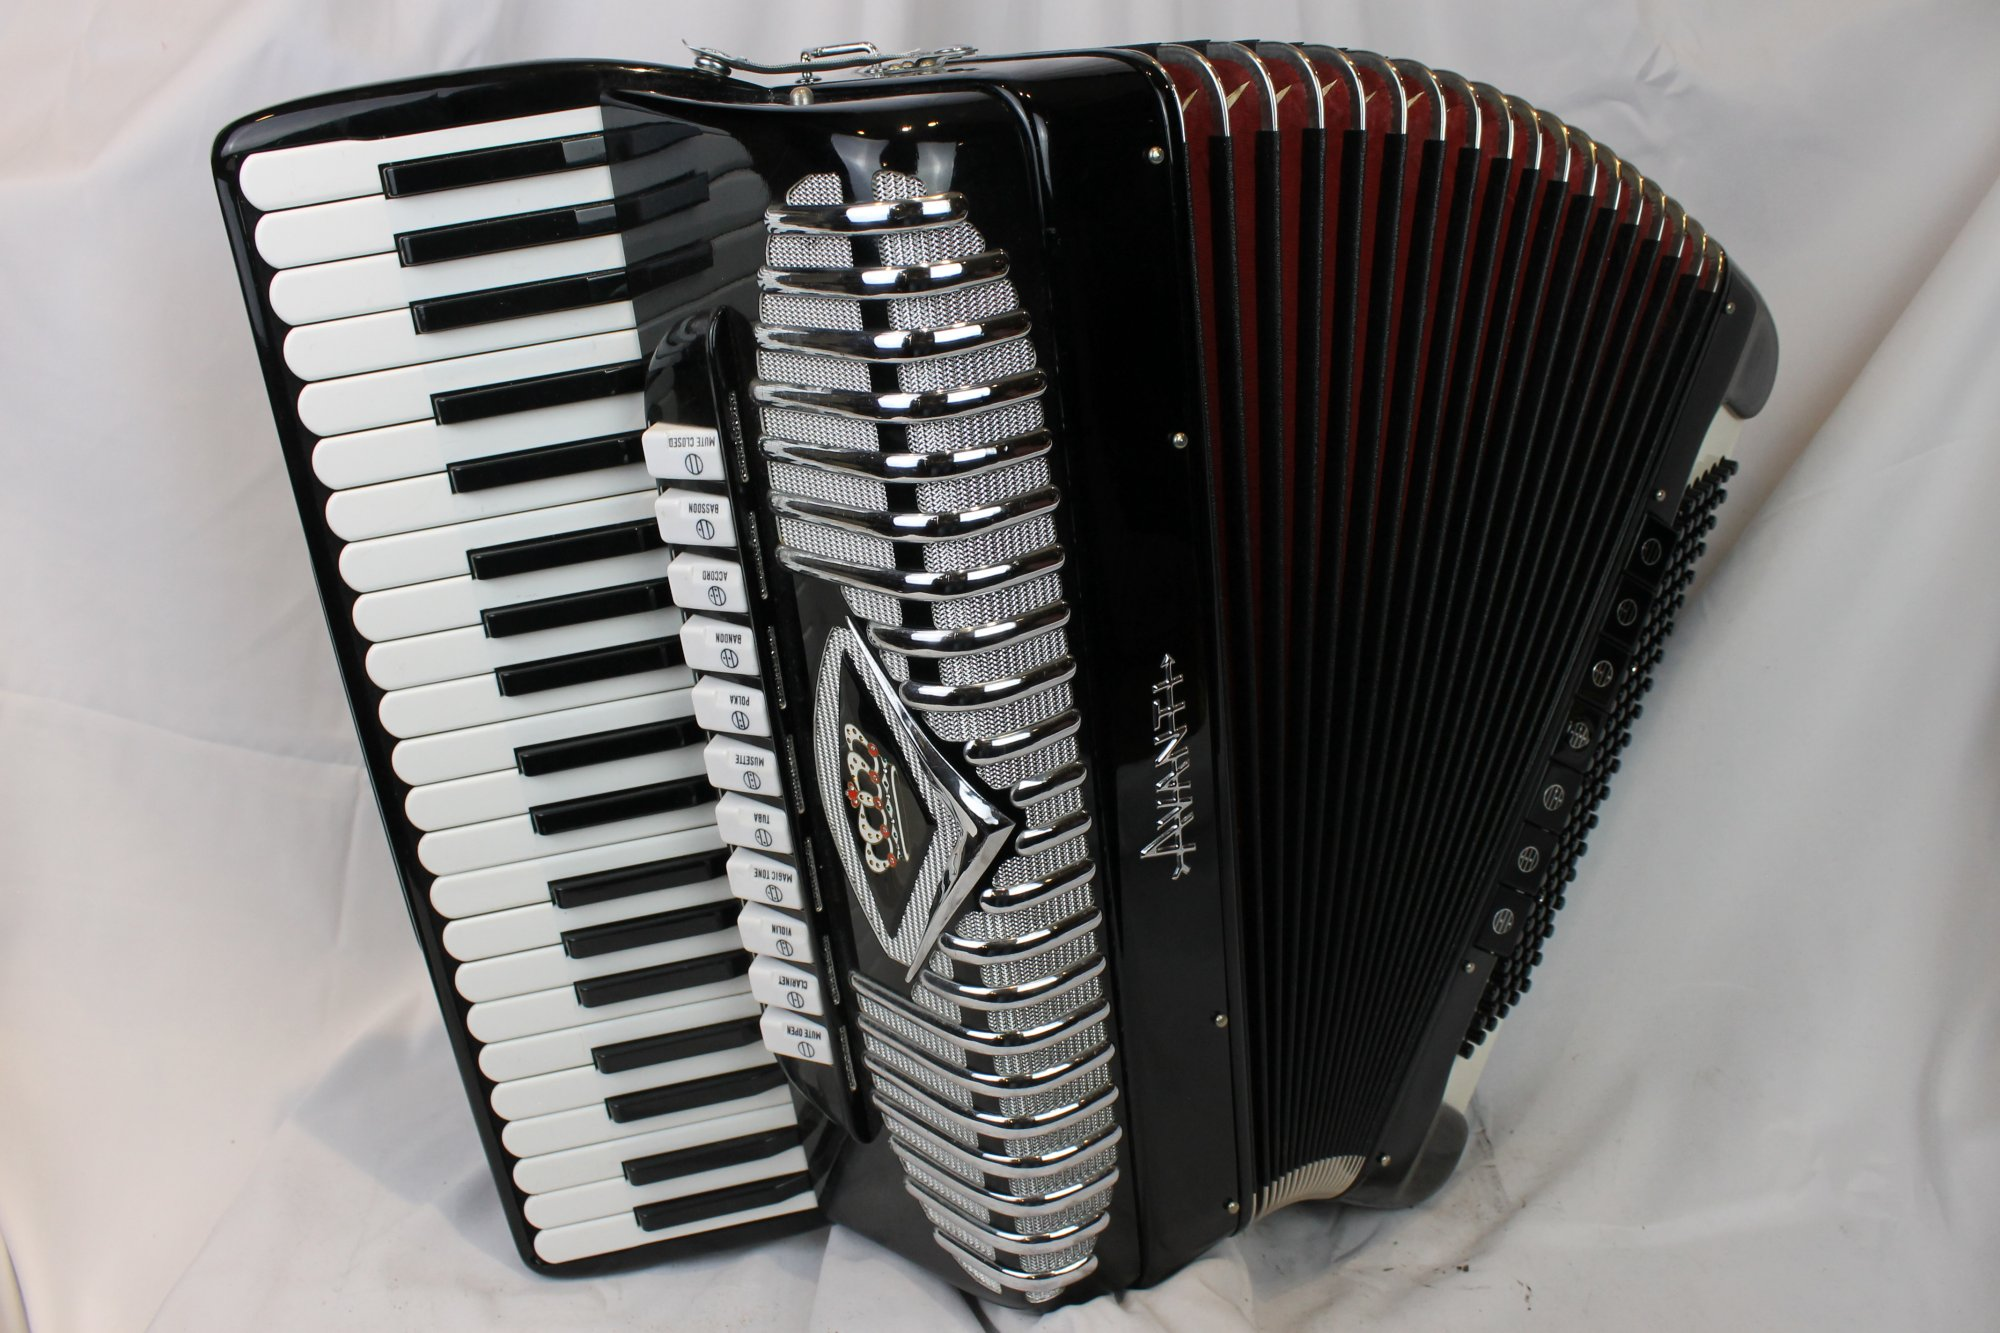 4090 - Like New Black Avanti Piano Accordion LMMM 41 120